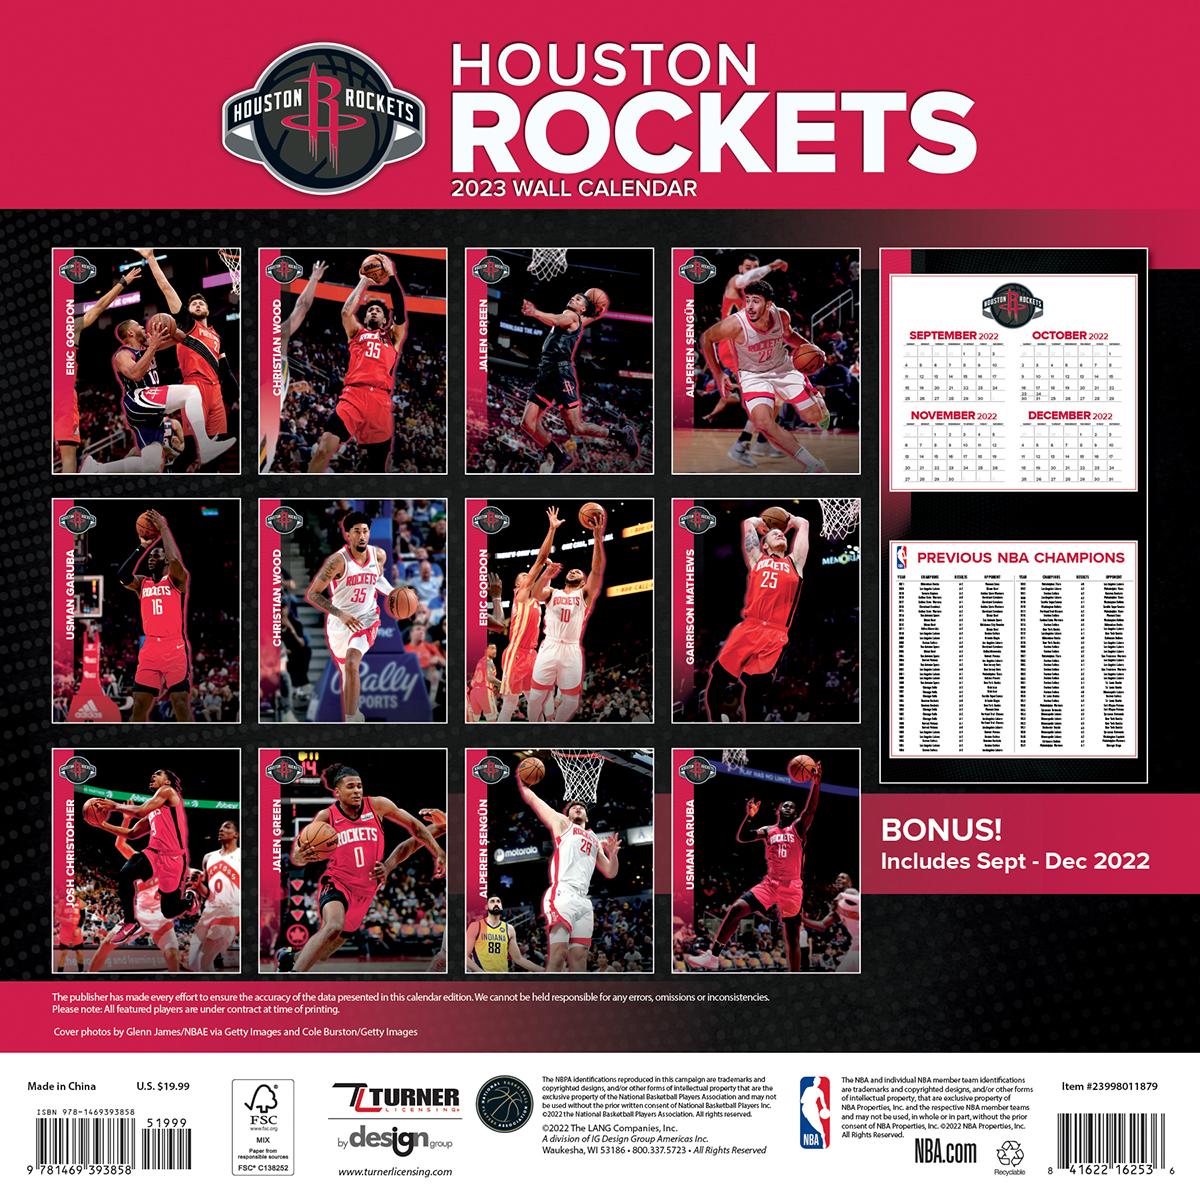 Houston Rockets 2018 Wall Calendar Buy At Khc Sports